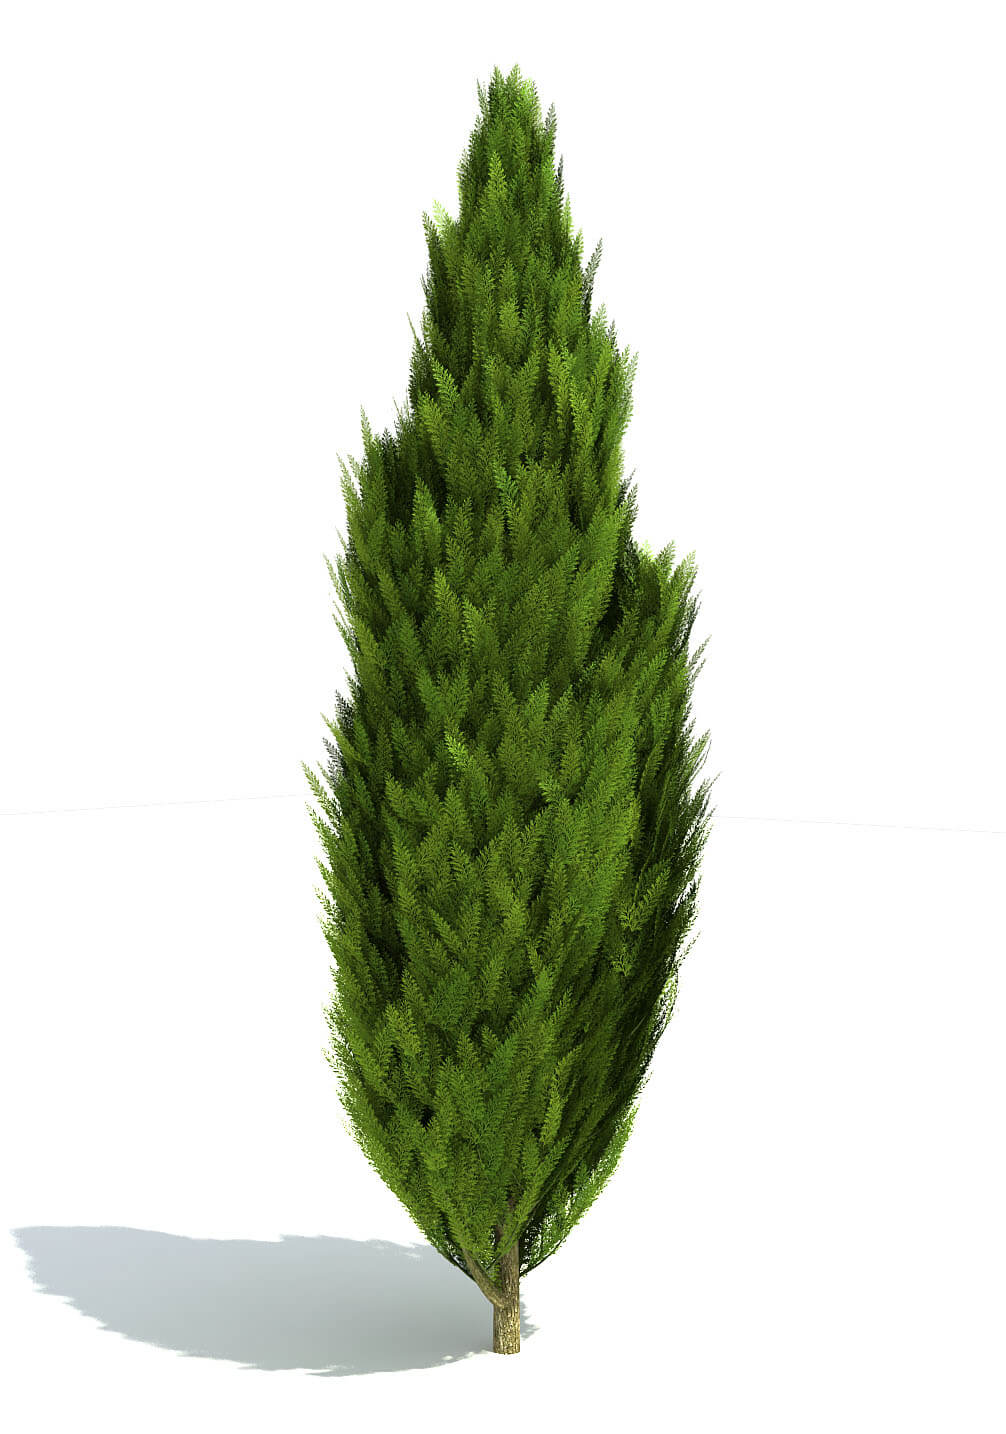 Free Plant Models For Growfx 3ds Max Models Kstudio